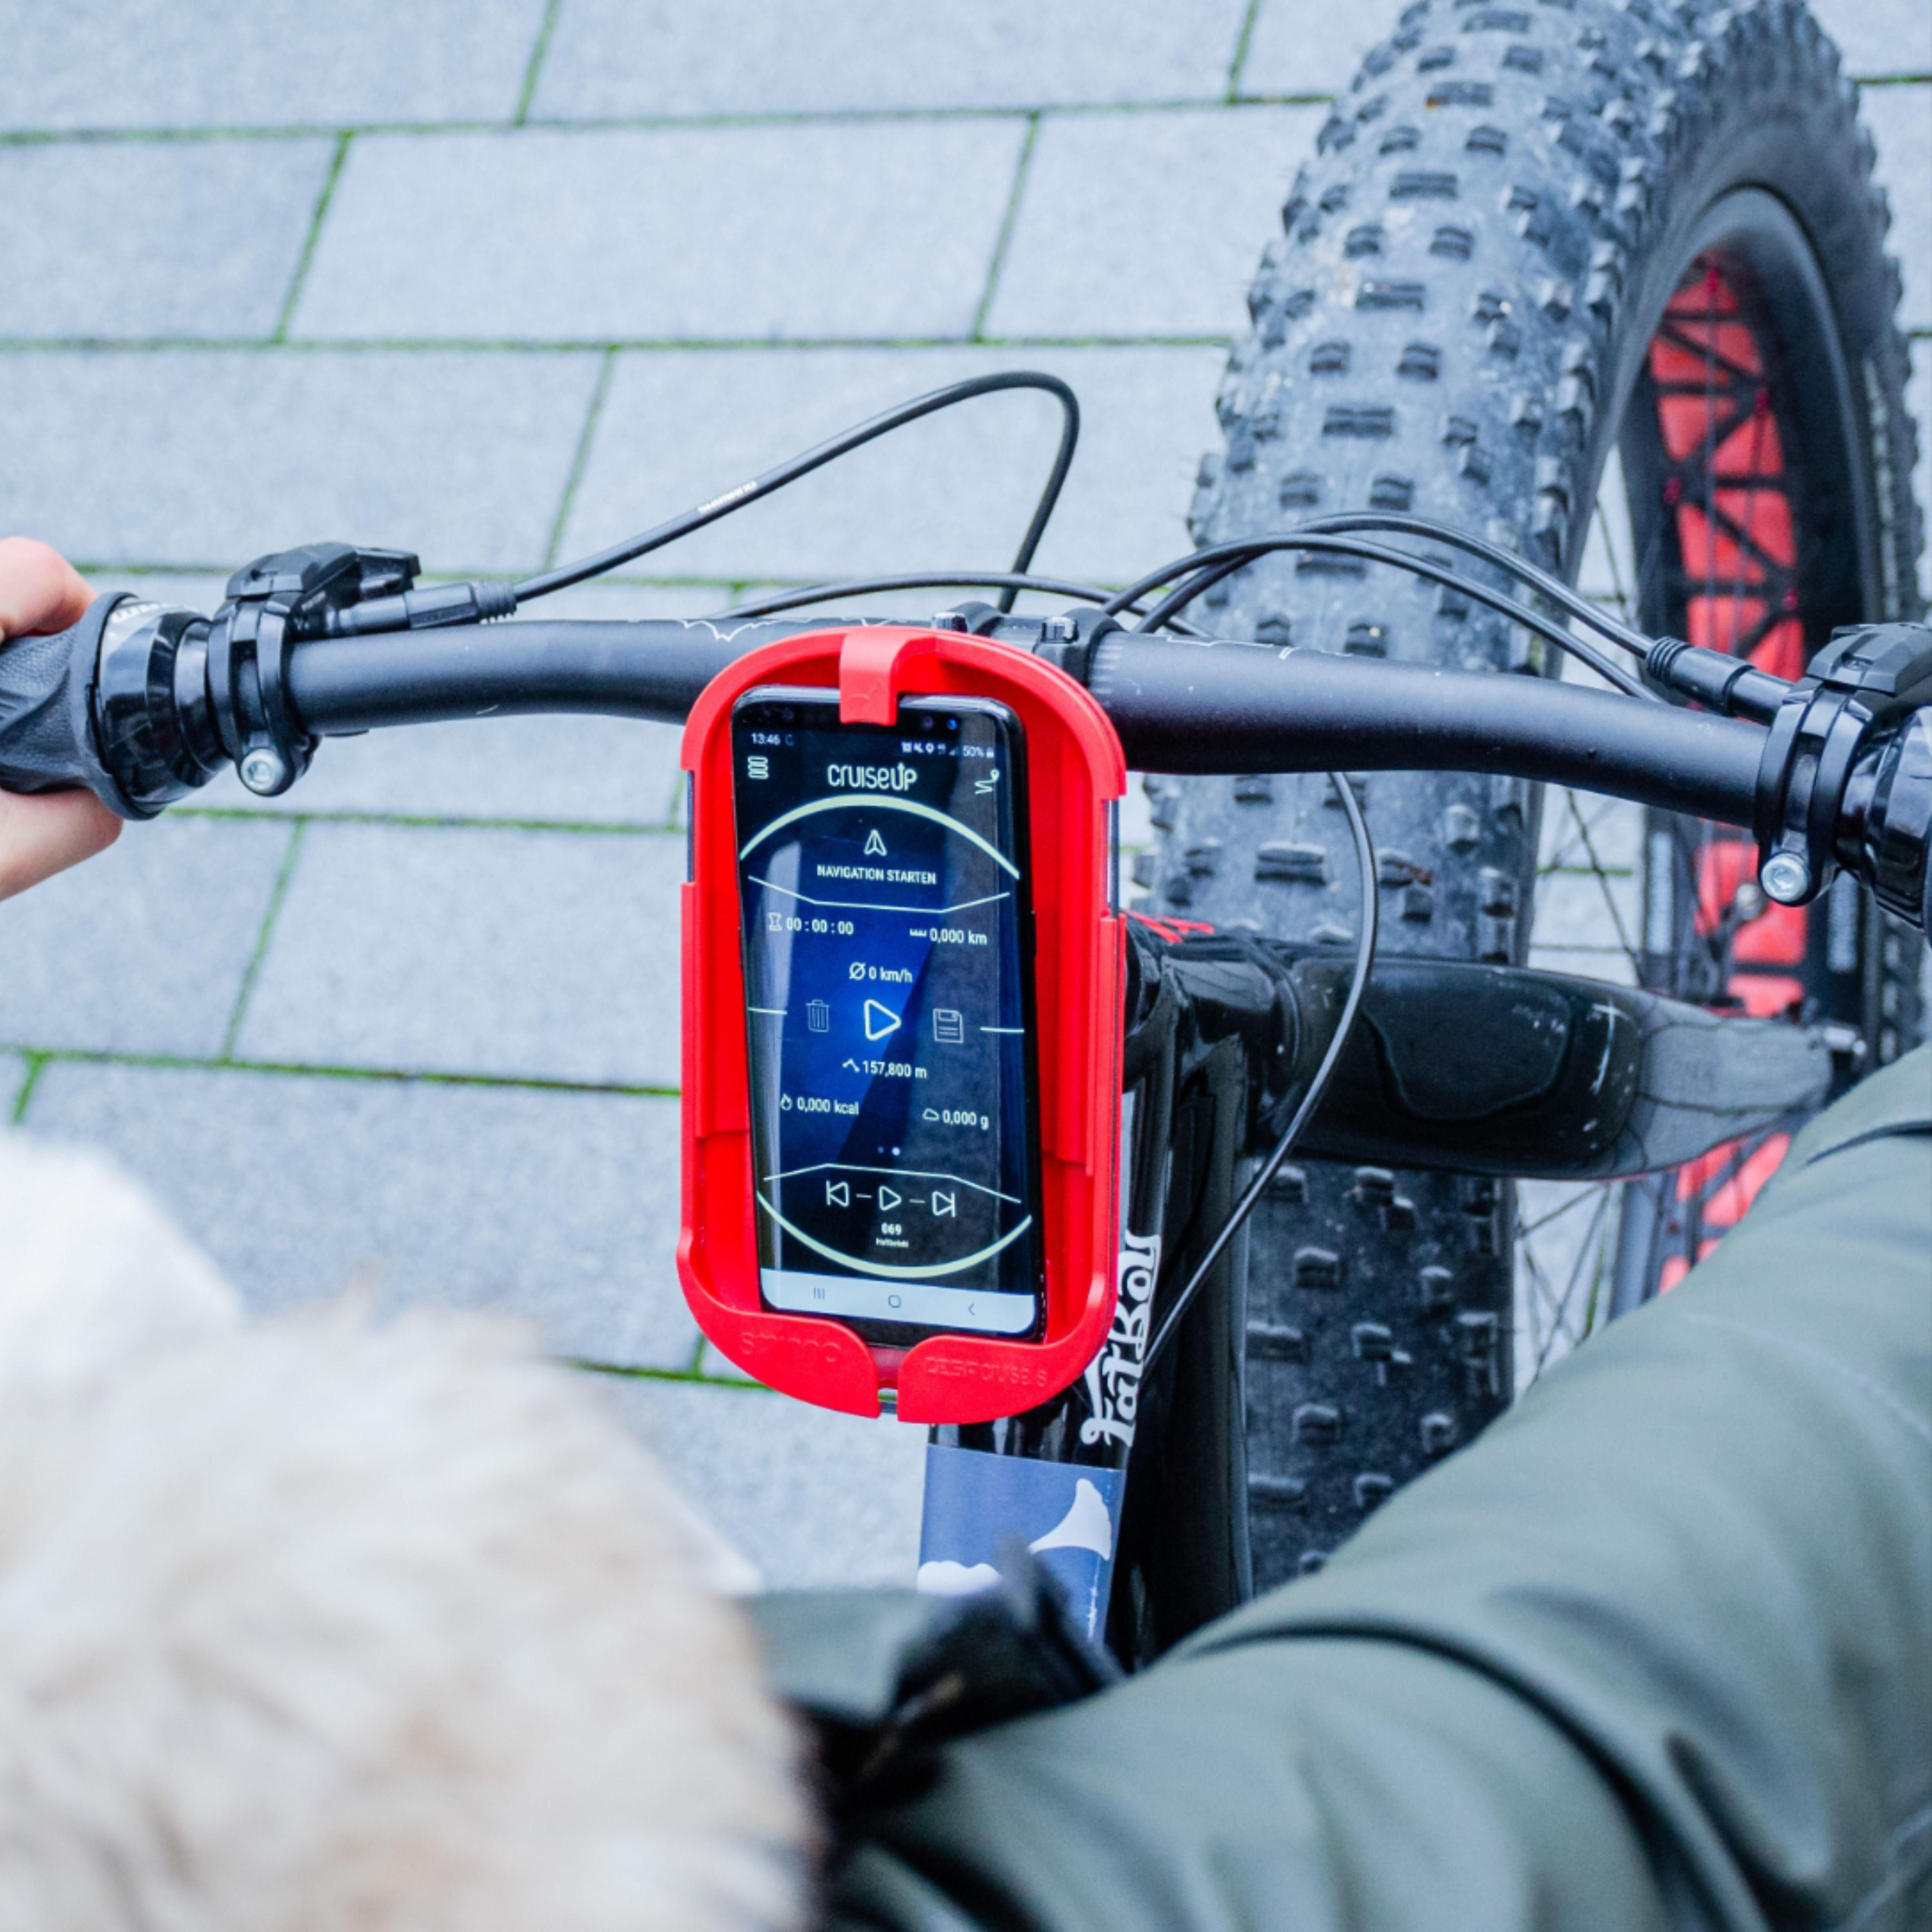 Cesacruise S In 2020 Ladekabel Freisprecheinrichtung Iphone 7 Plus